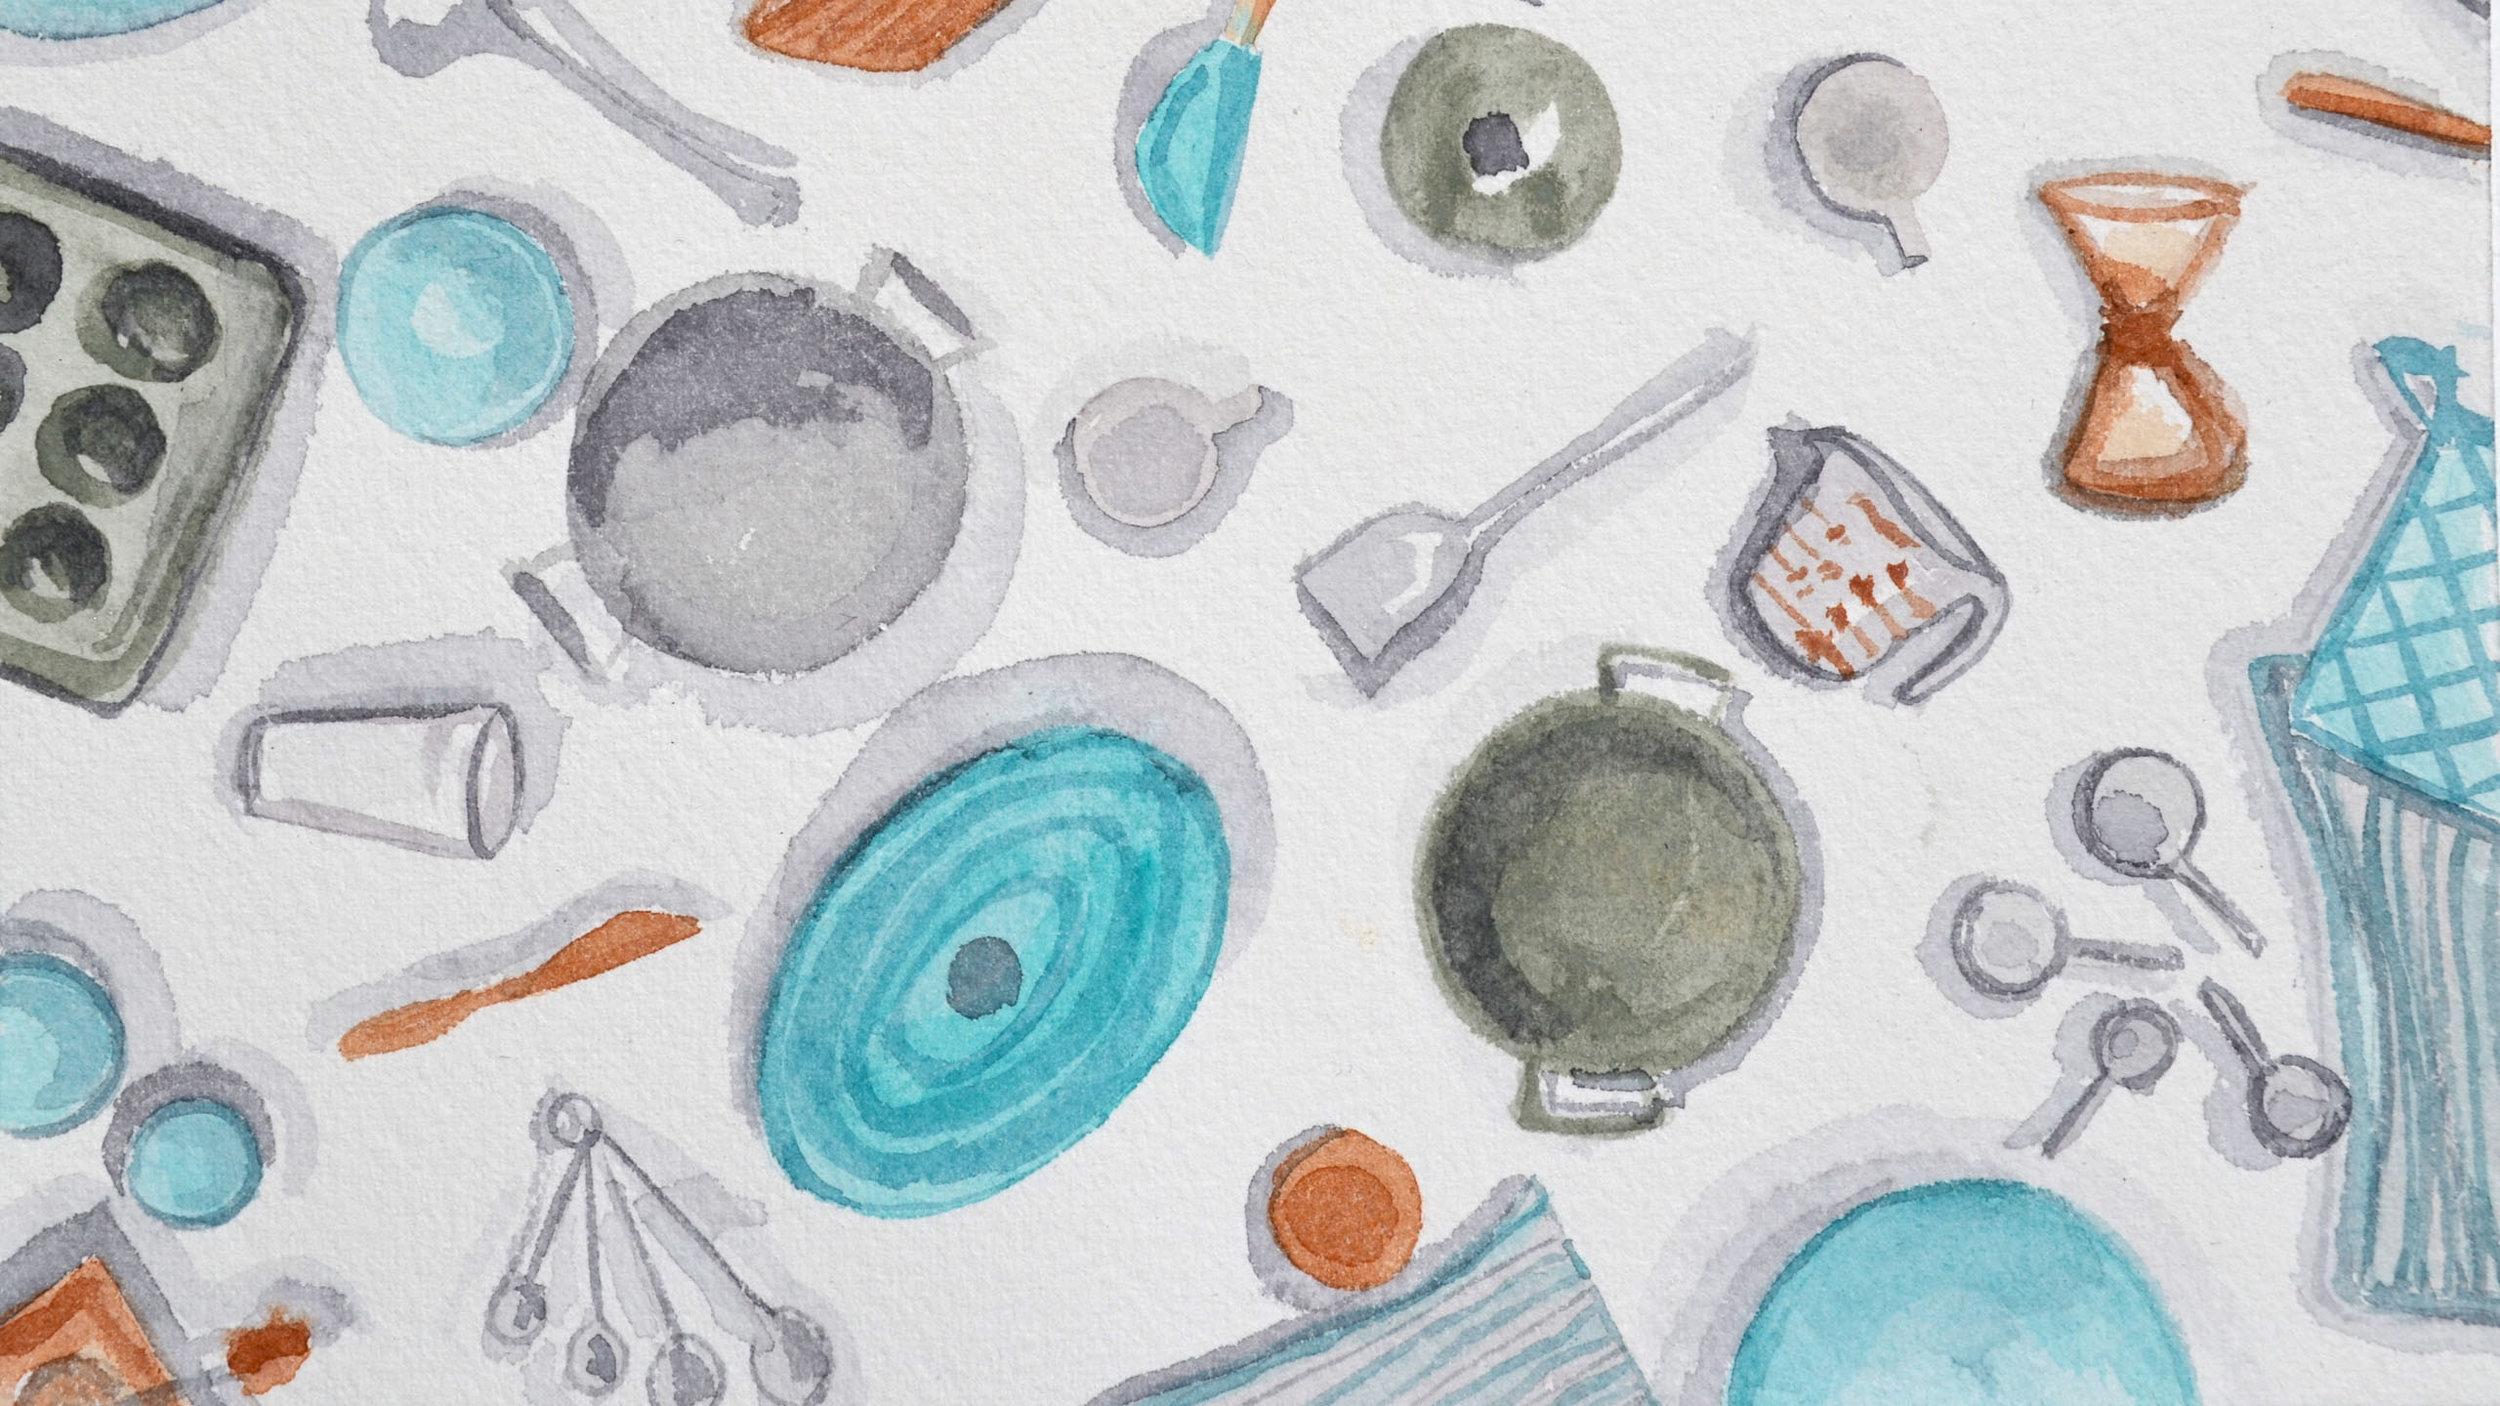 Kitchen-Utensils-April-2560x1440